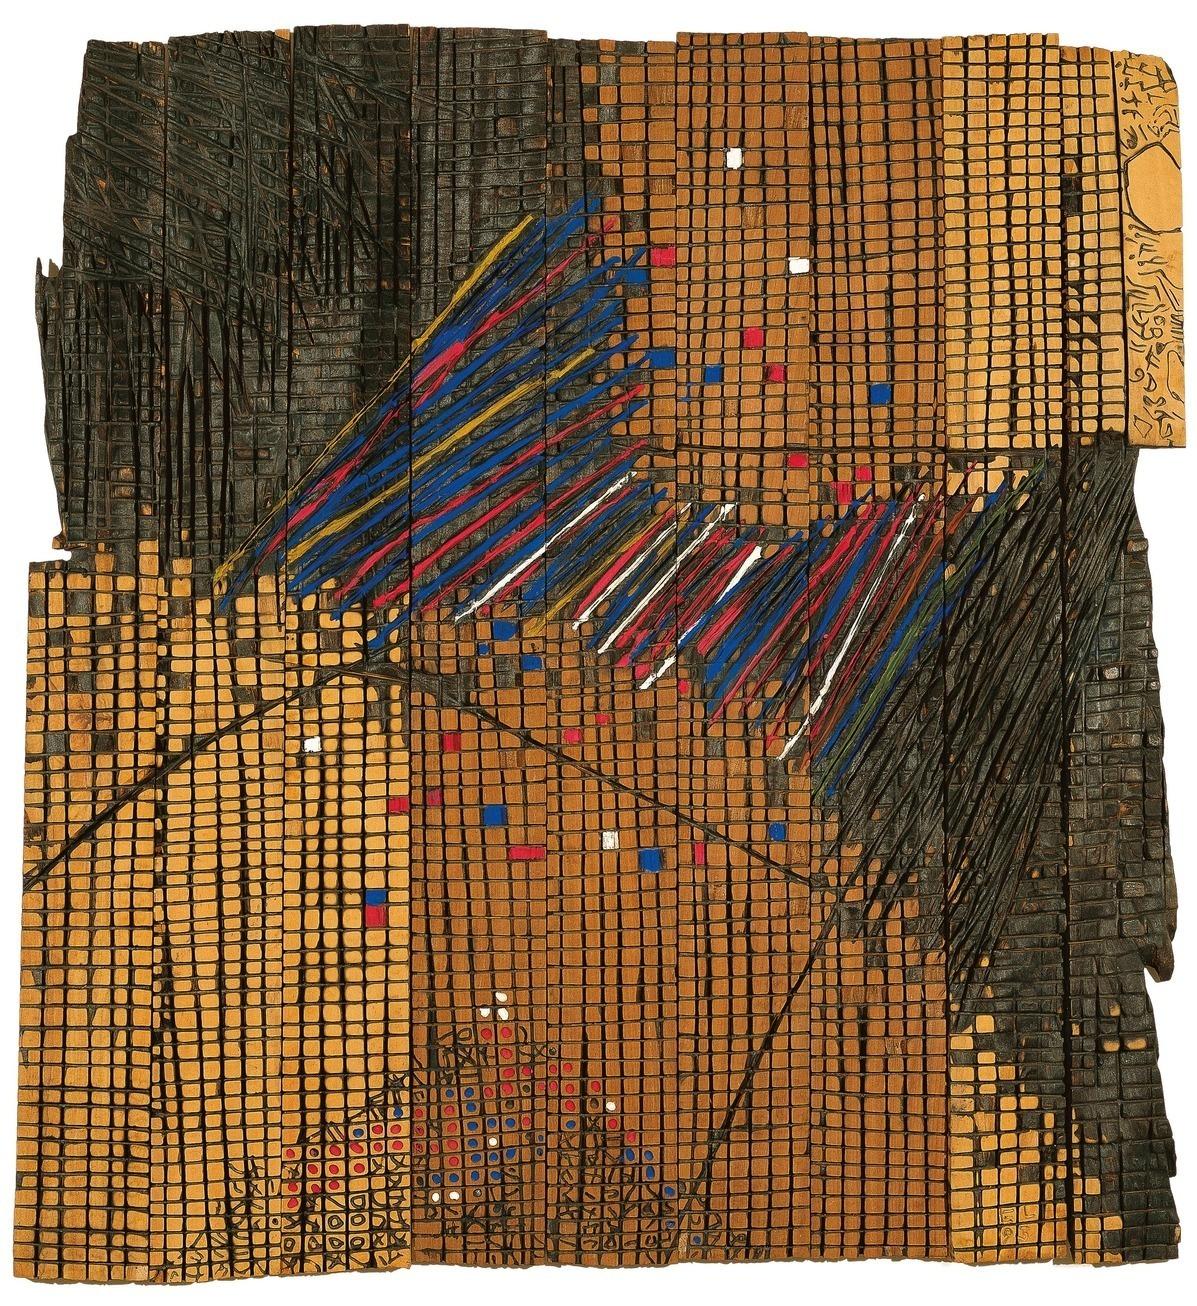 On View: 'El Anatsui: Triumphant Scale' at Haus der Kunst Museum